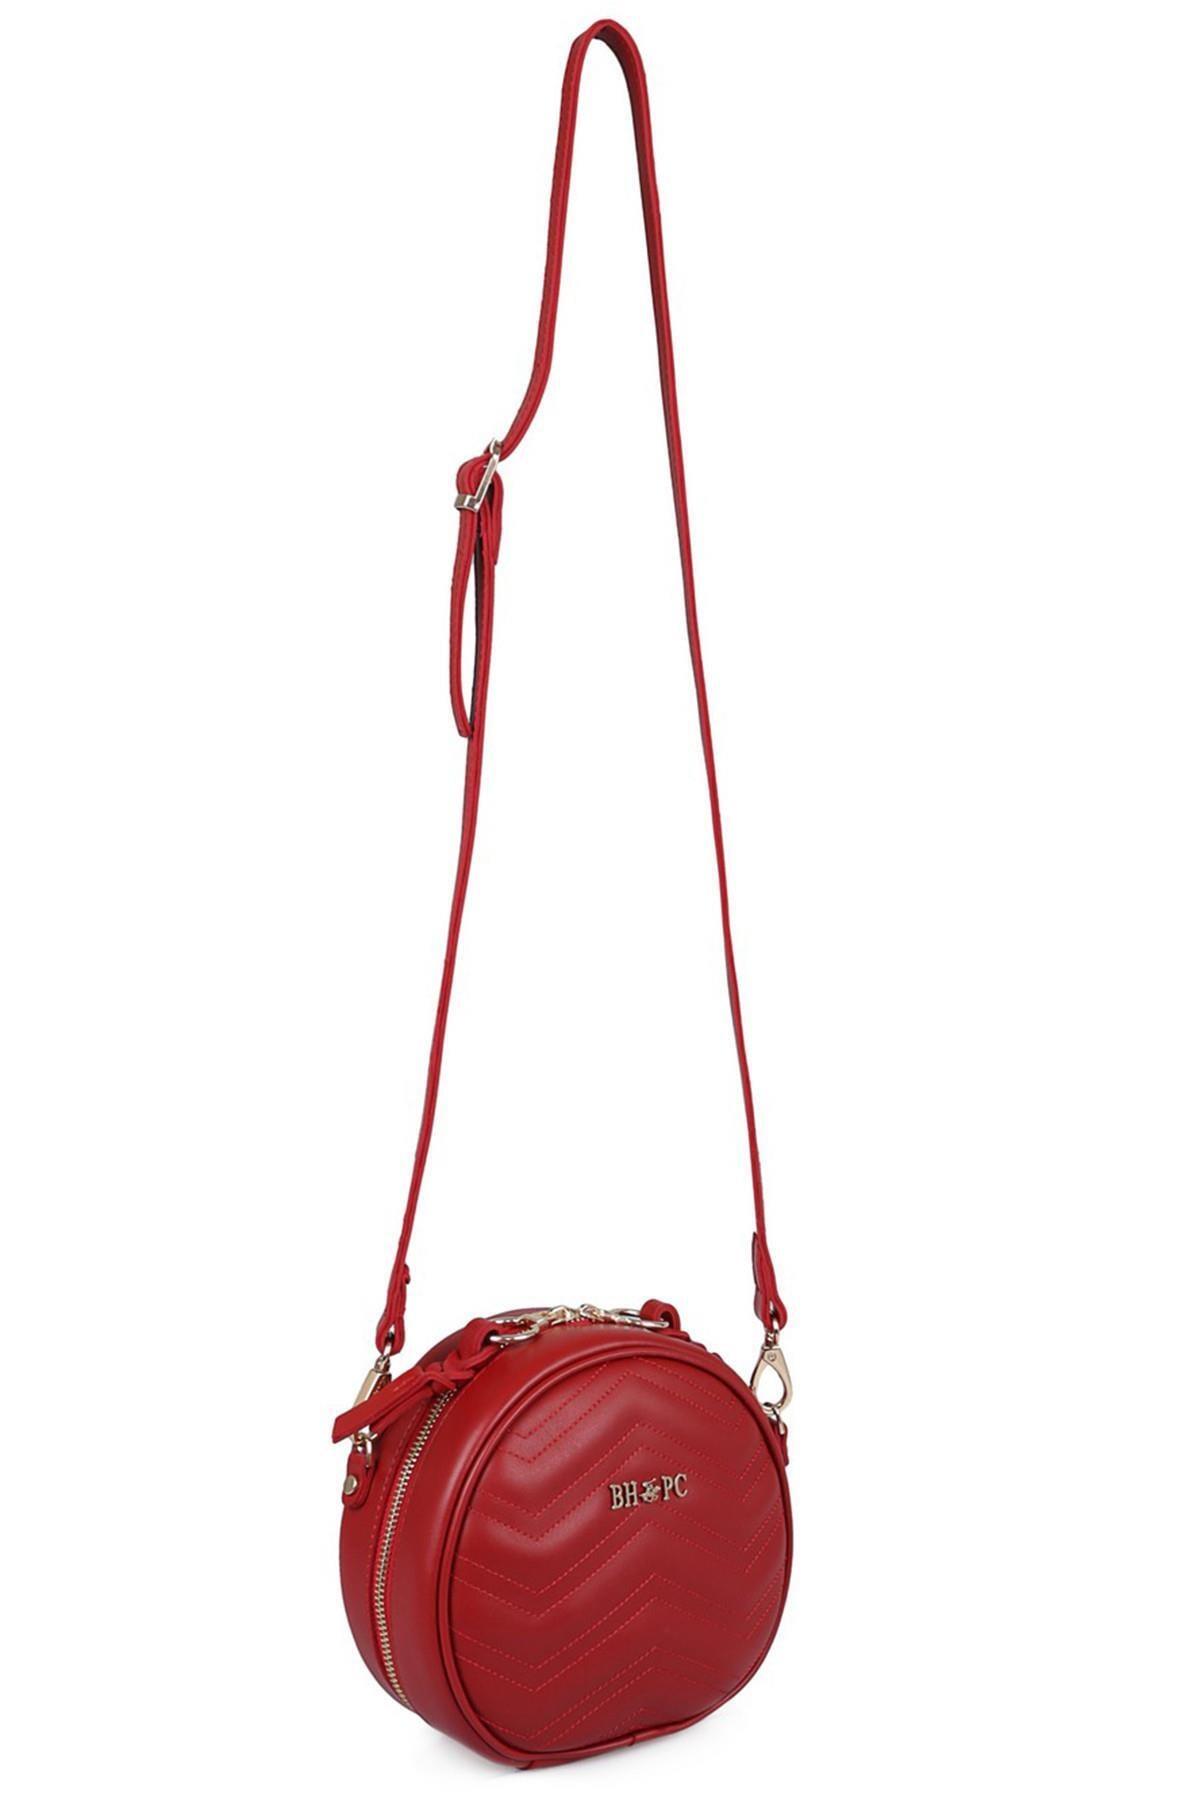 Beverly Hills Polo Club Kadın Zikzaklı Yuvarlak Bel Çantası Kırmızı 2